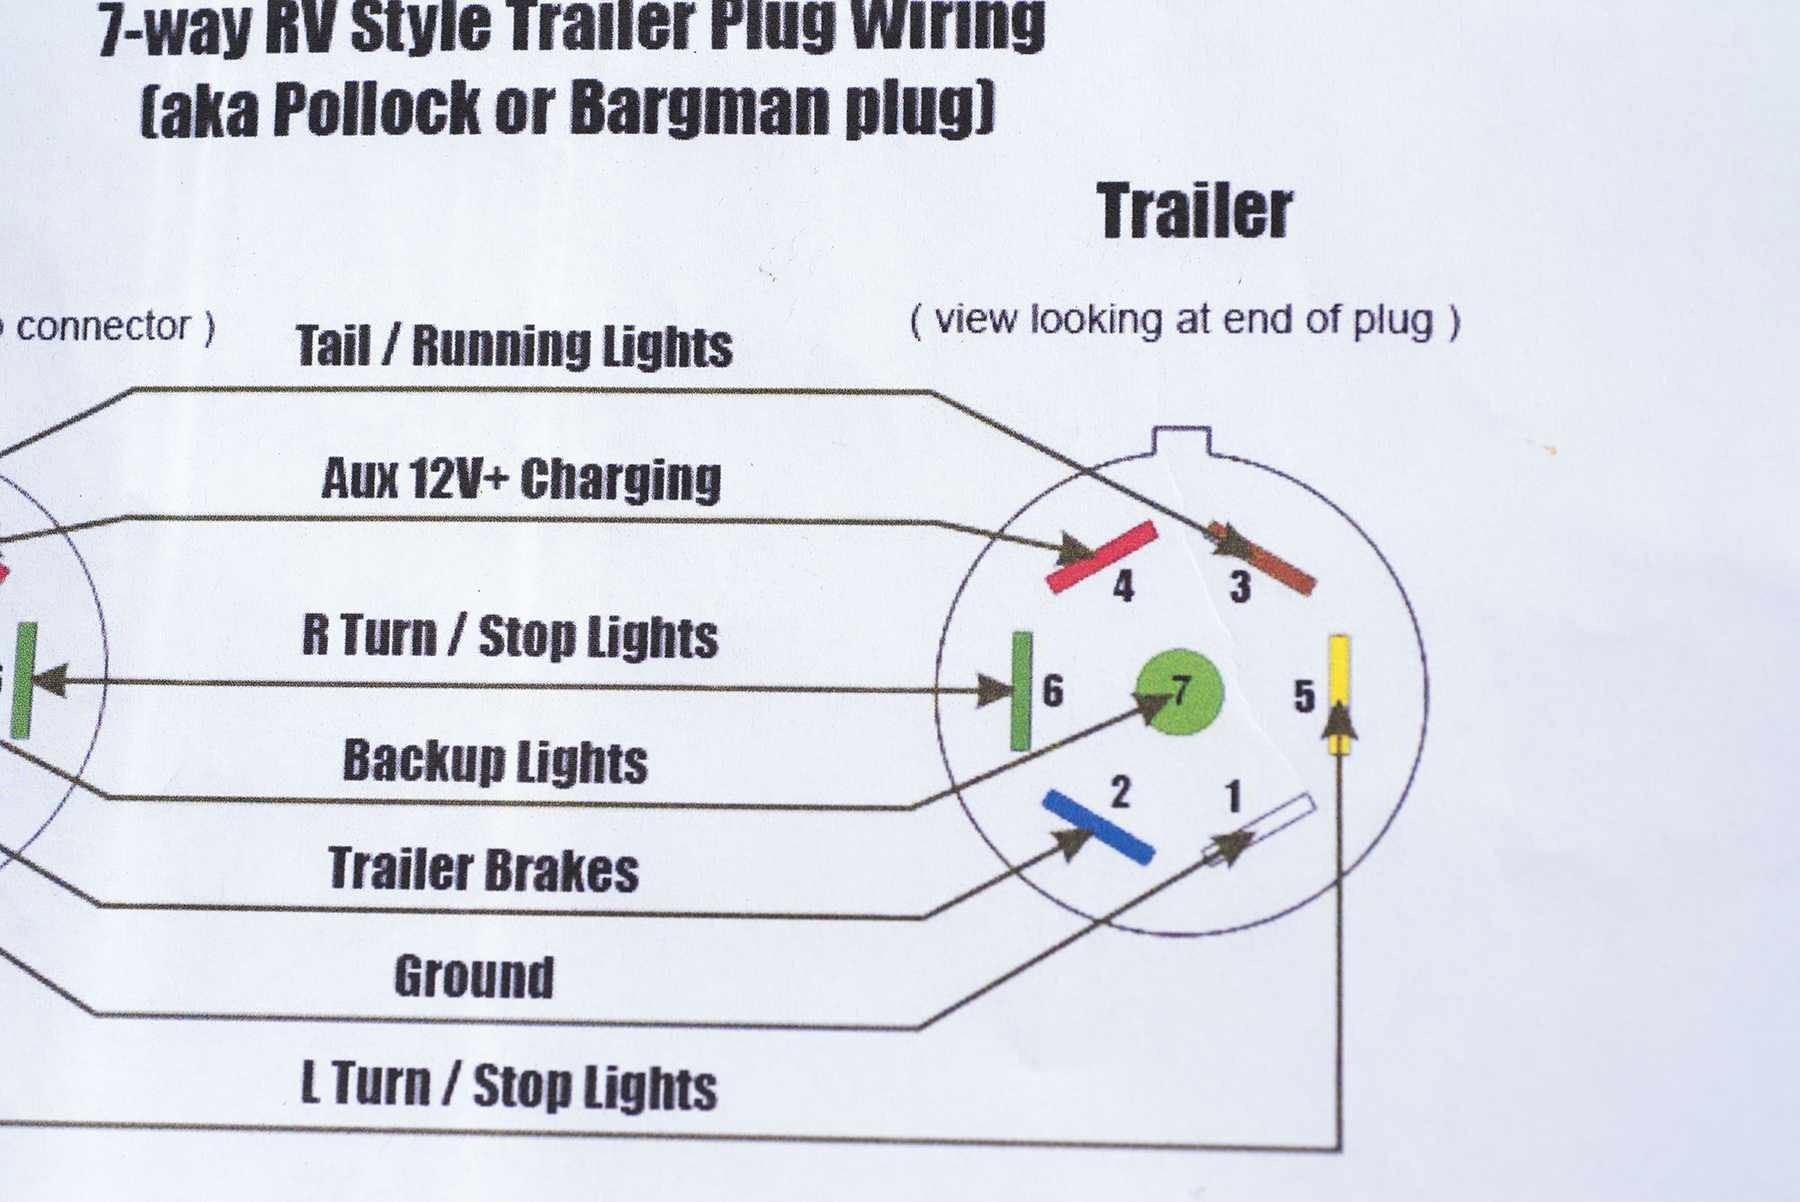 Trailer 7 Pin Wiring Diagram 7 Pin Trailer Wiring Diagram with Brakes Luxury Wiring Diagram for Of Trailer 7 Pin Wiring Diagram